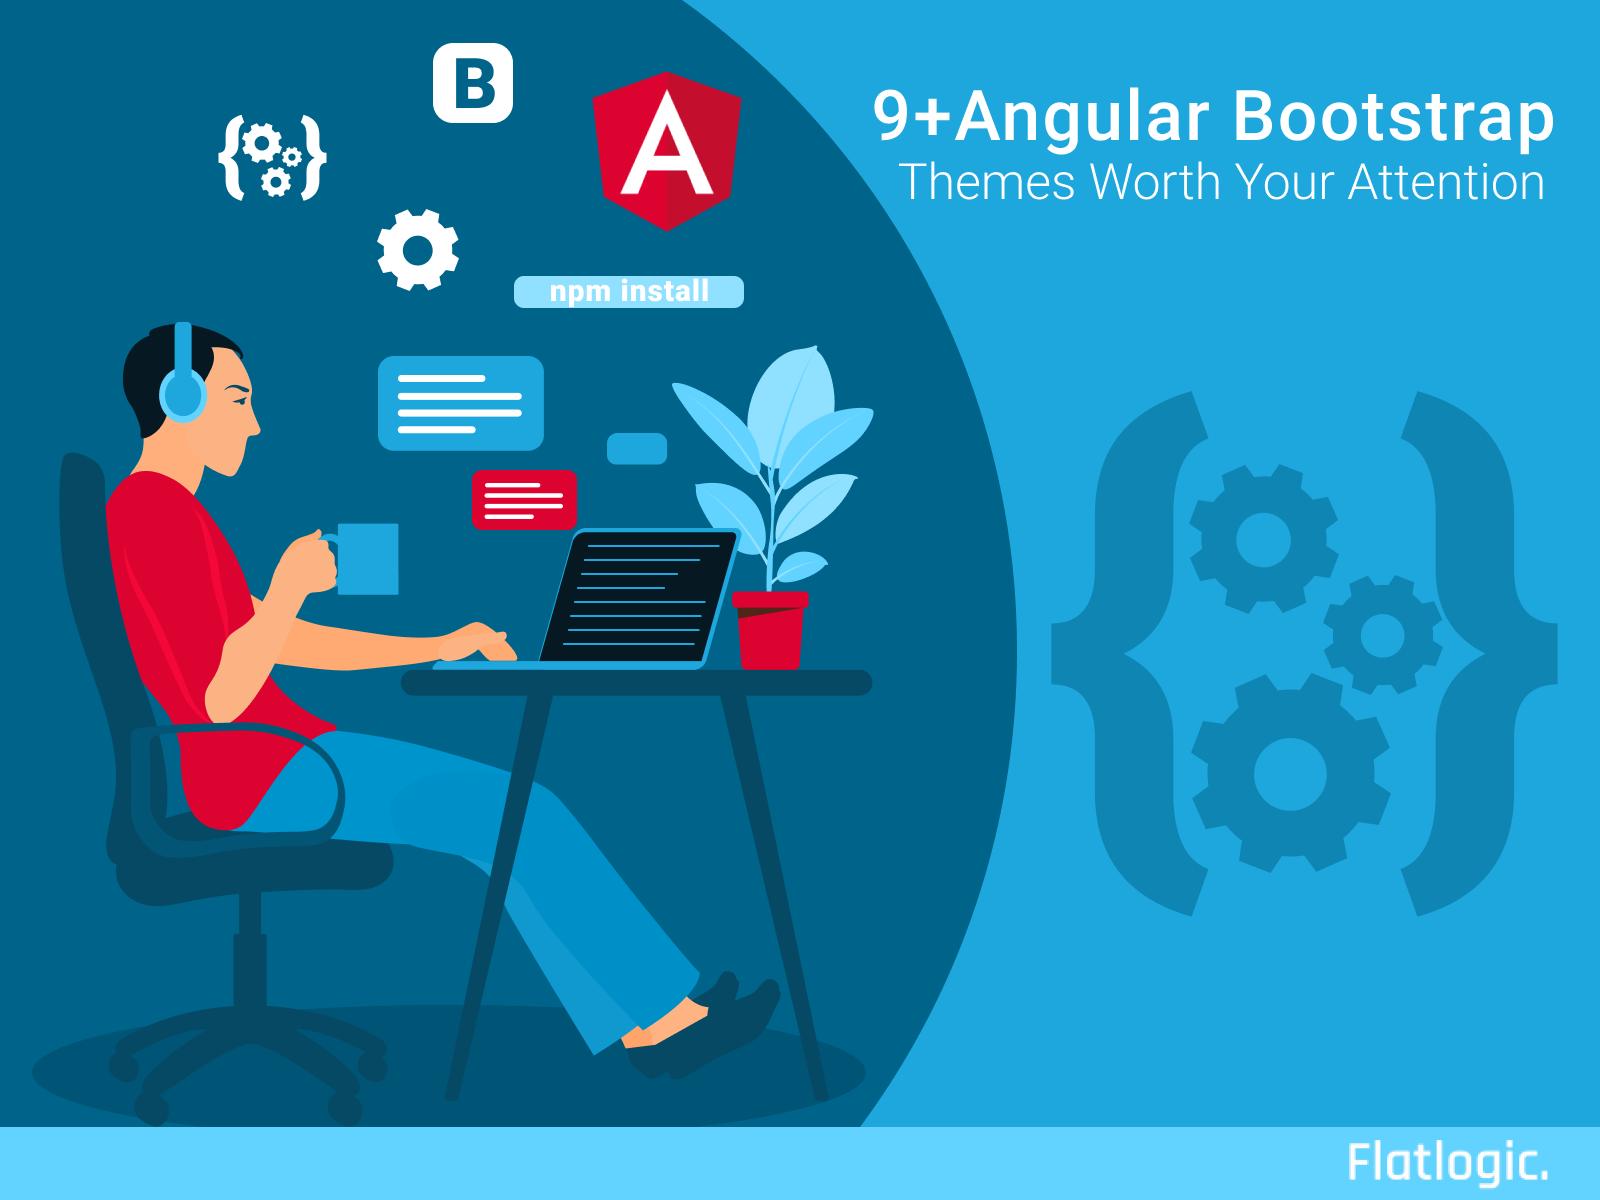 9+ Angular Bootstrap Themes Worth Your Attention - Flatlogic Blog